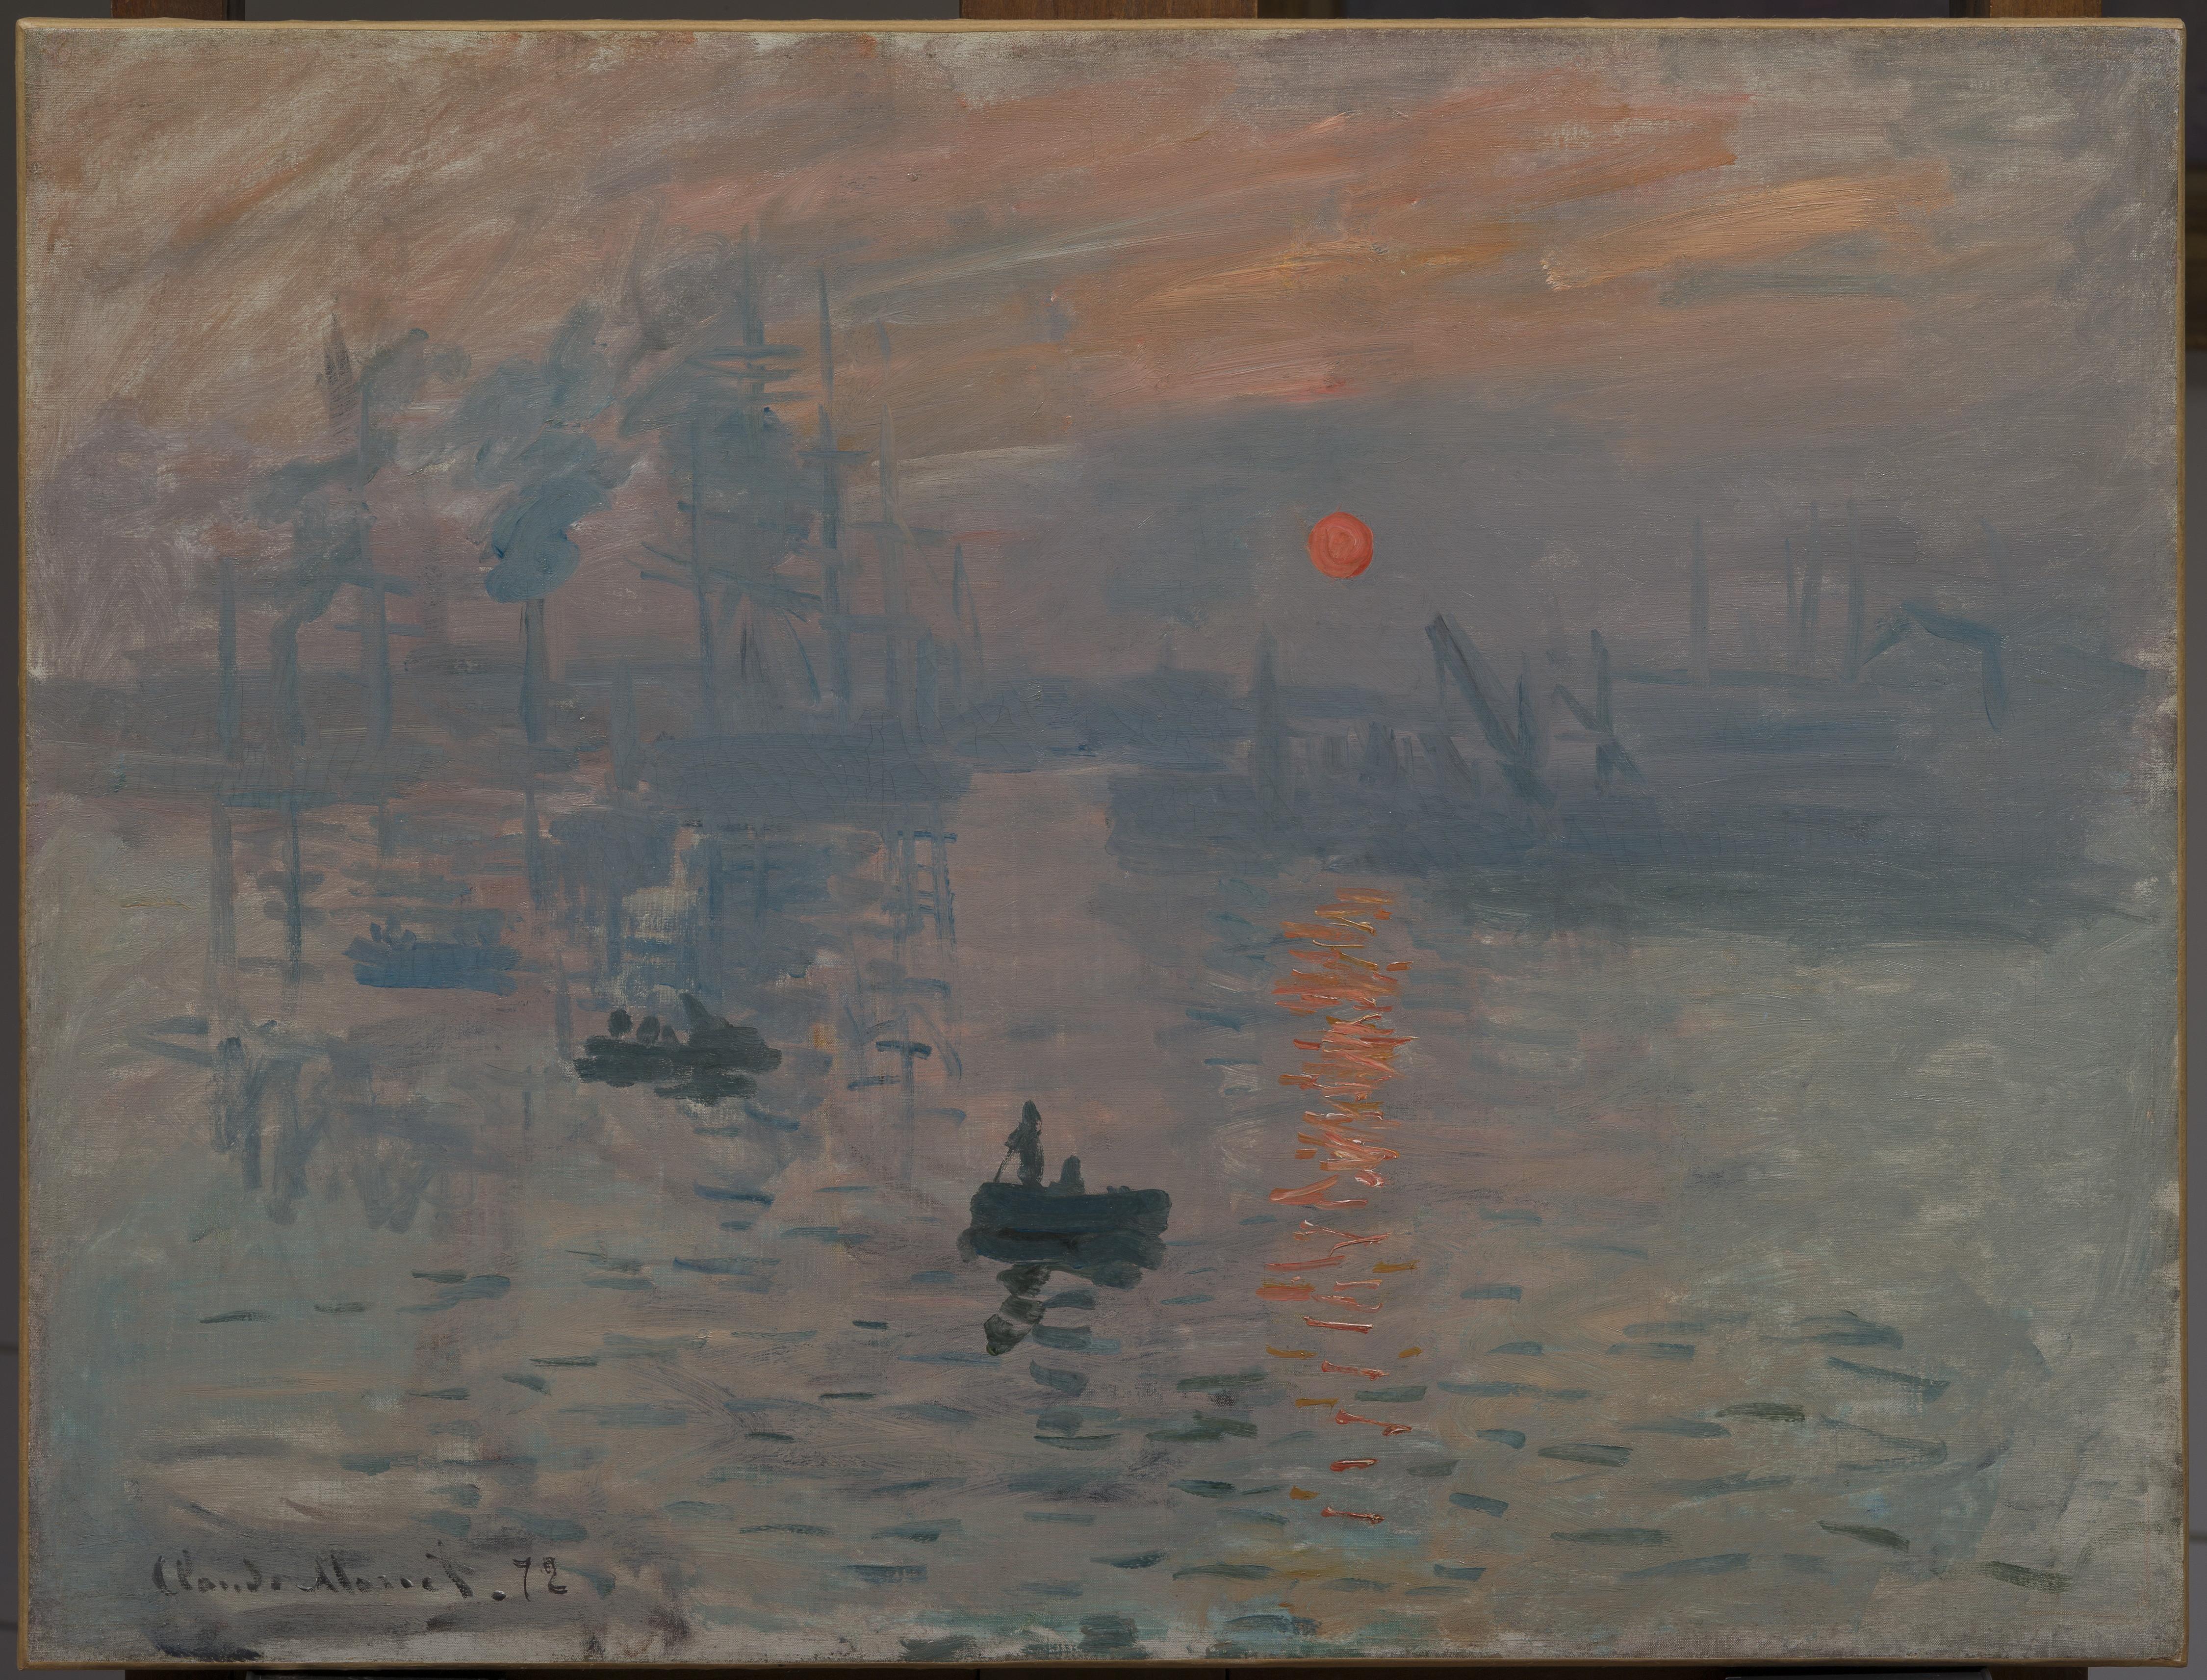 Exposition : Impression, soleil levant